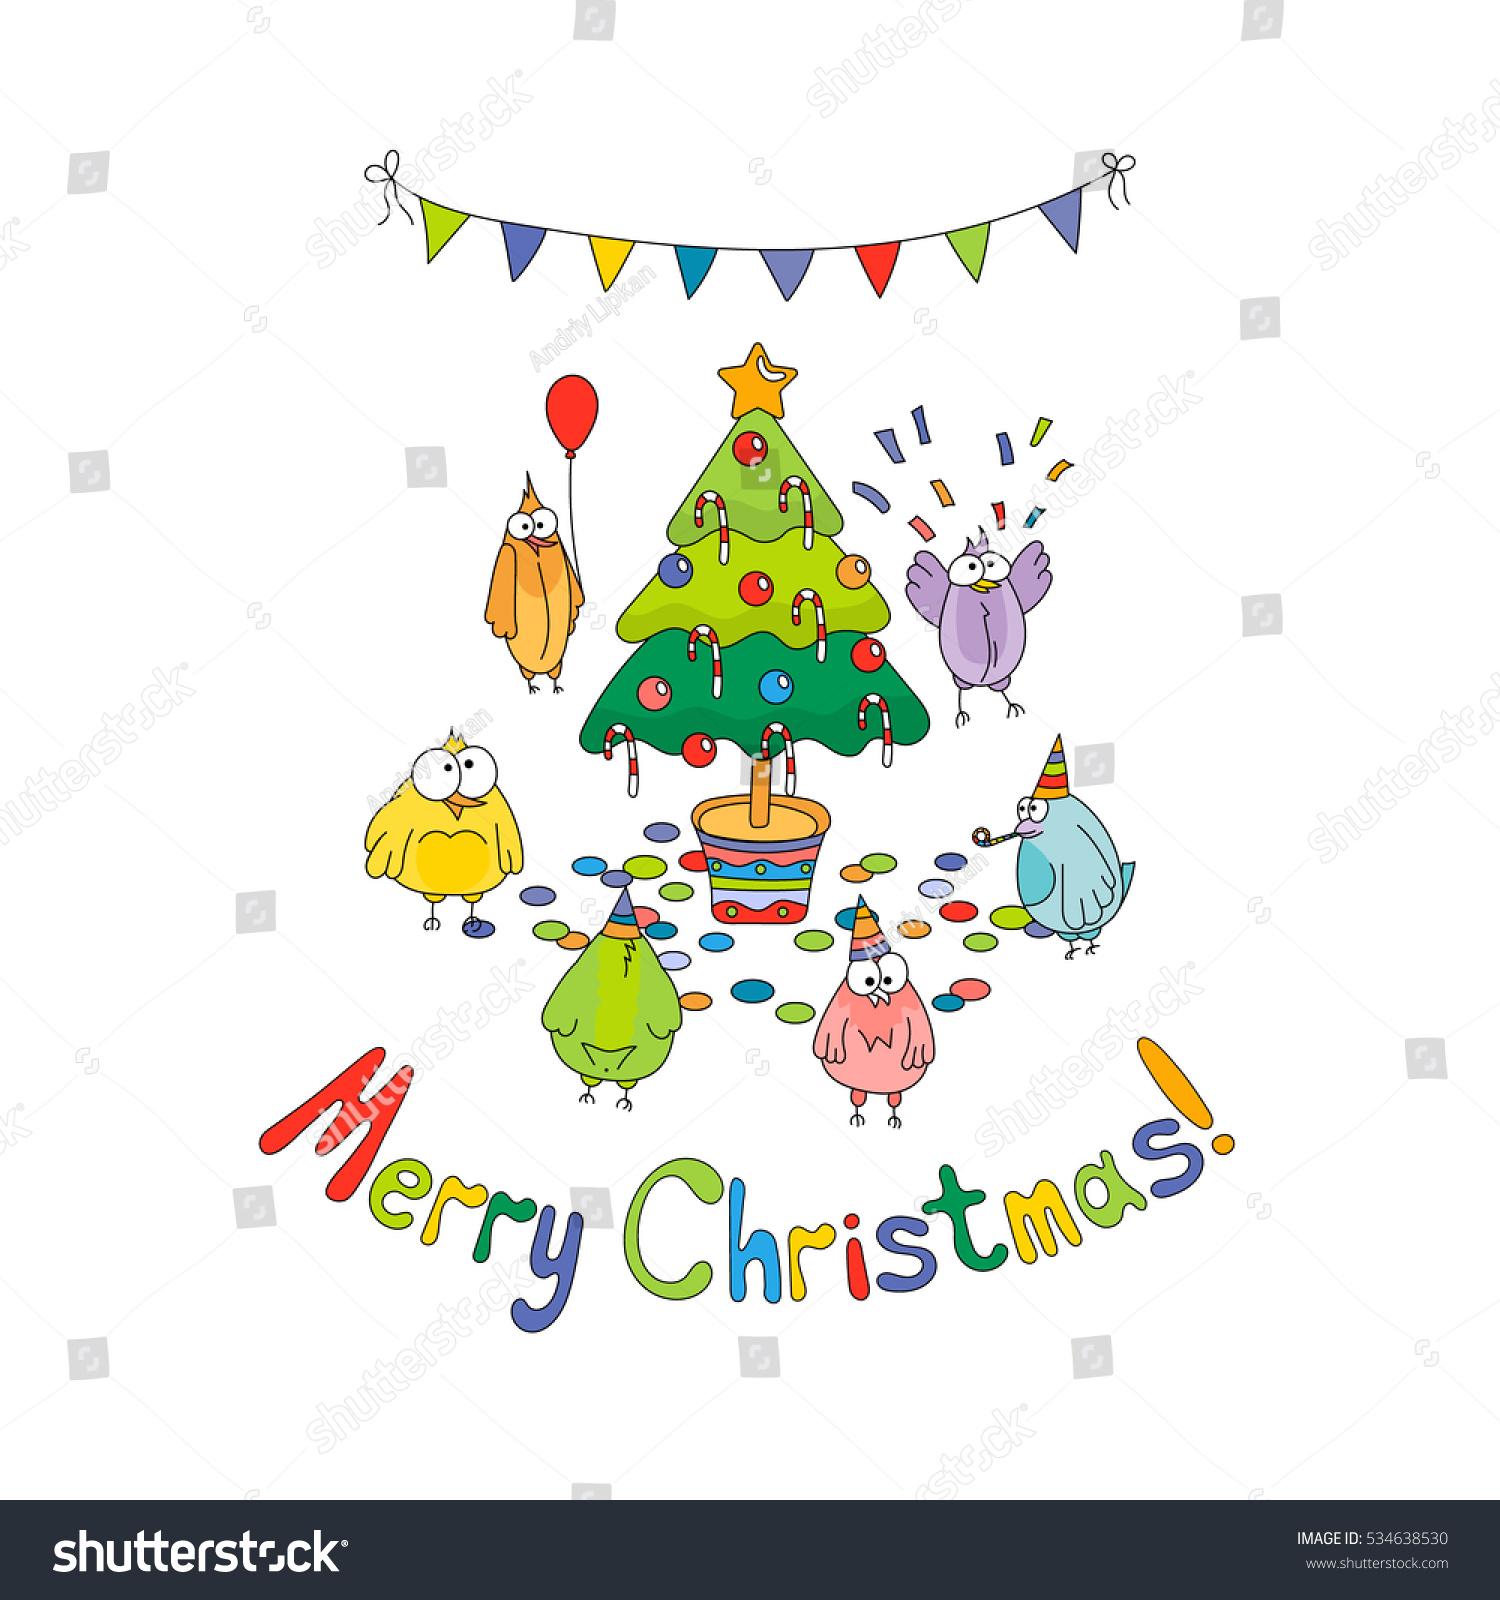 Merry Christmas Greeting Card White Cartoon Stock Vector (Royalty ...